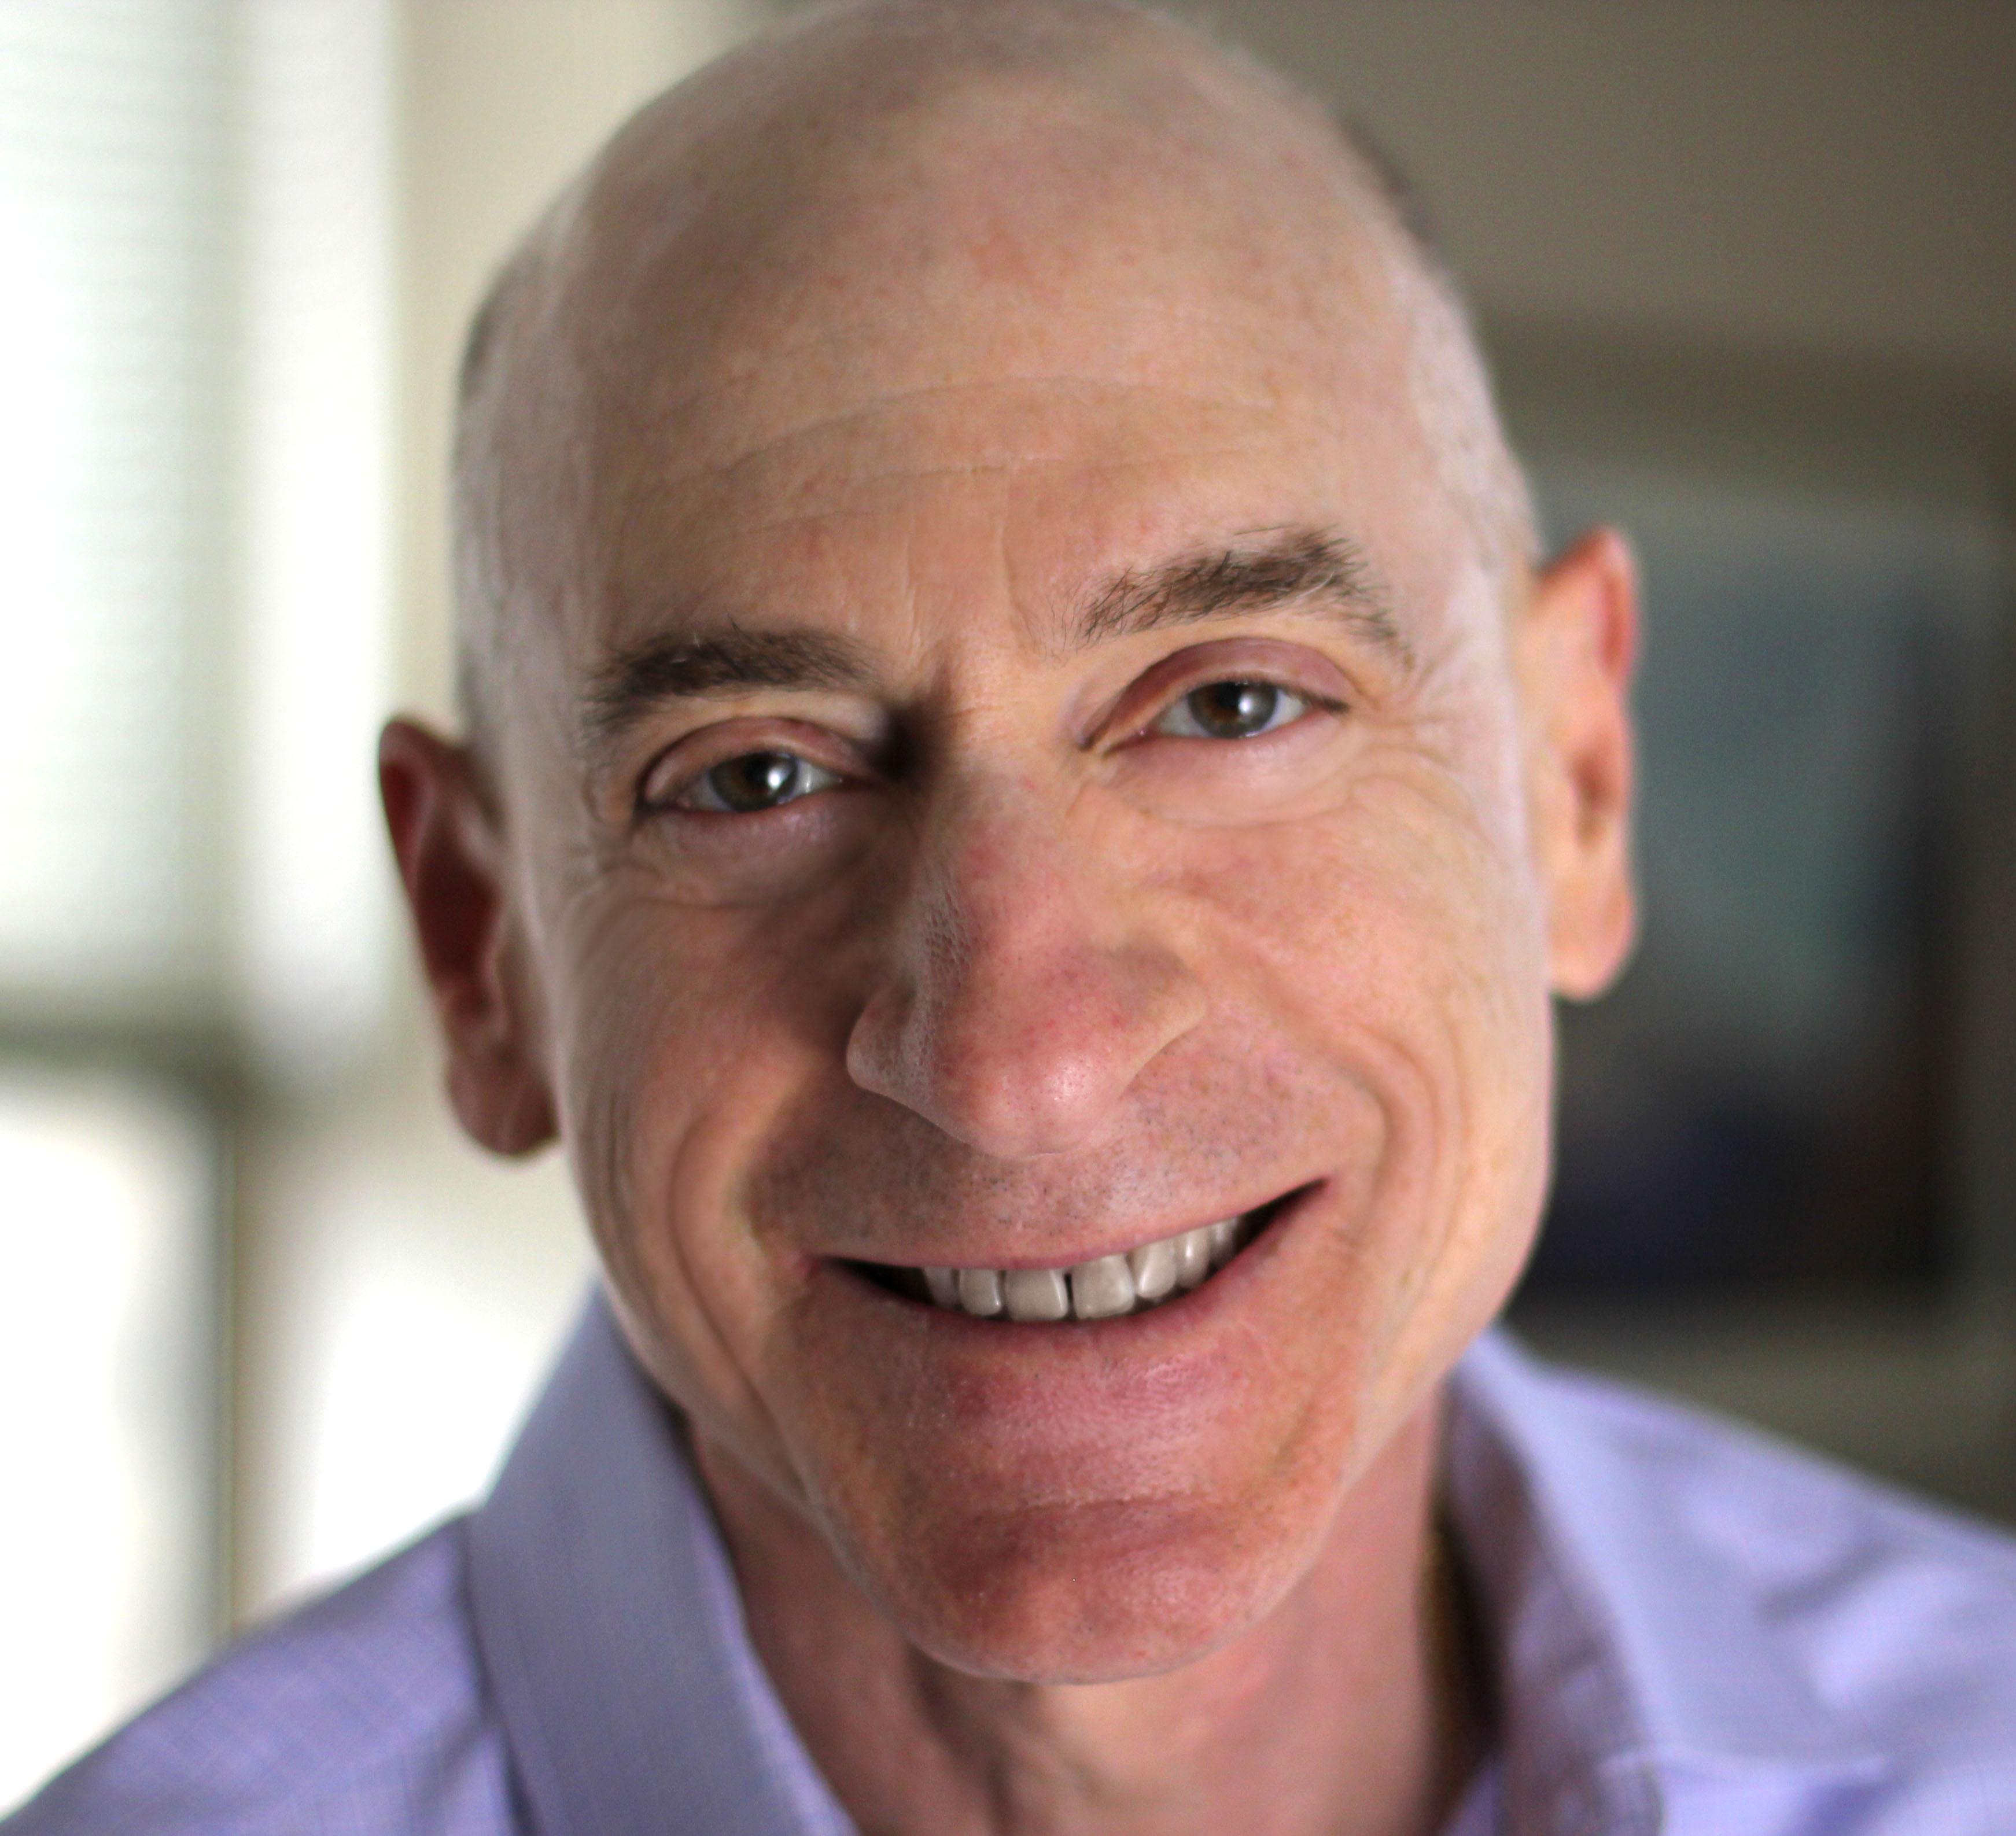 Kenneth Korach, President and CEO, IndustrySafe, Inc.